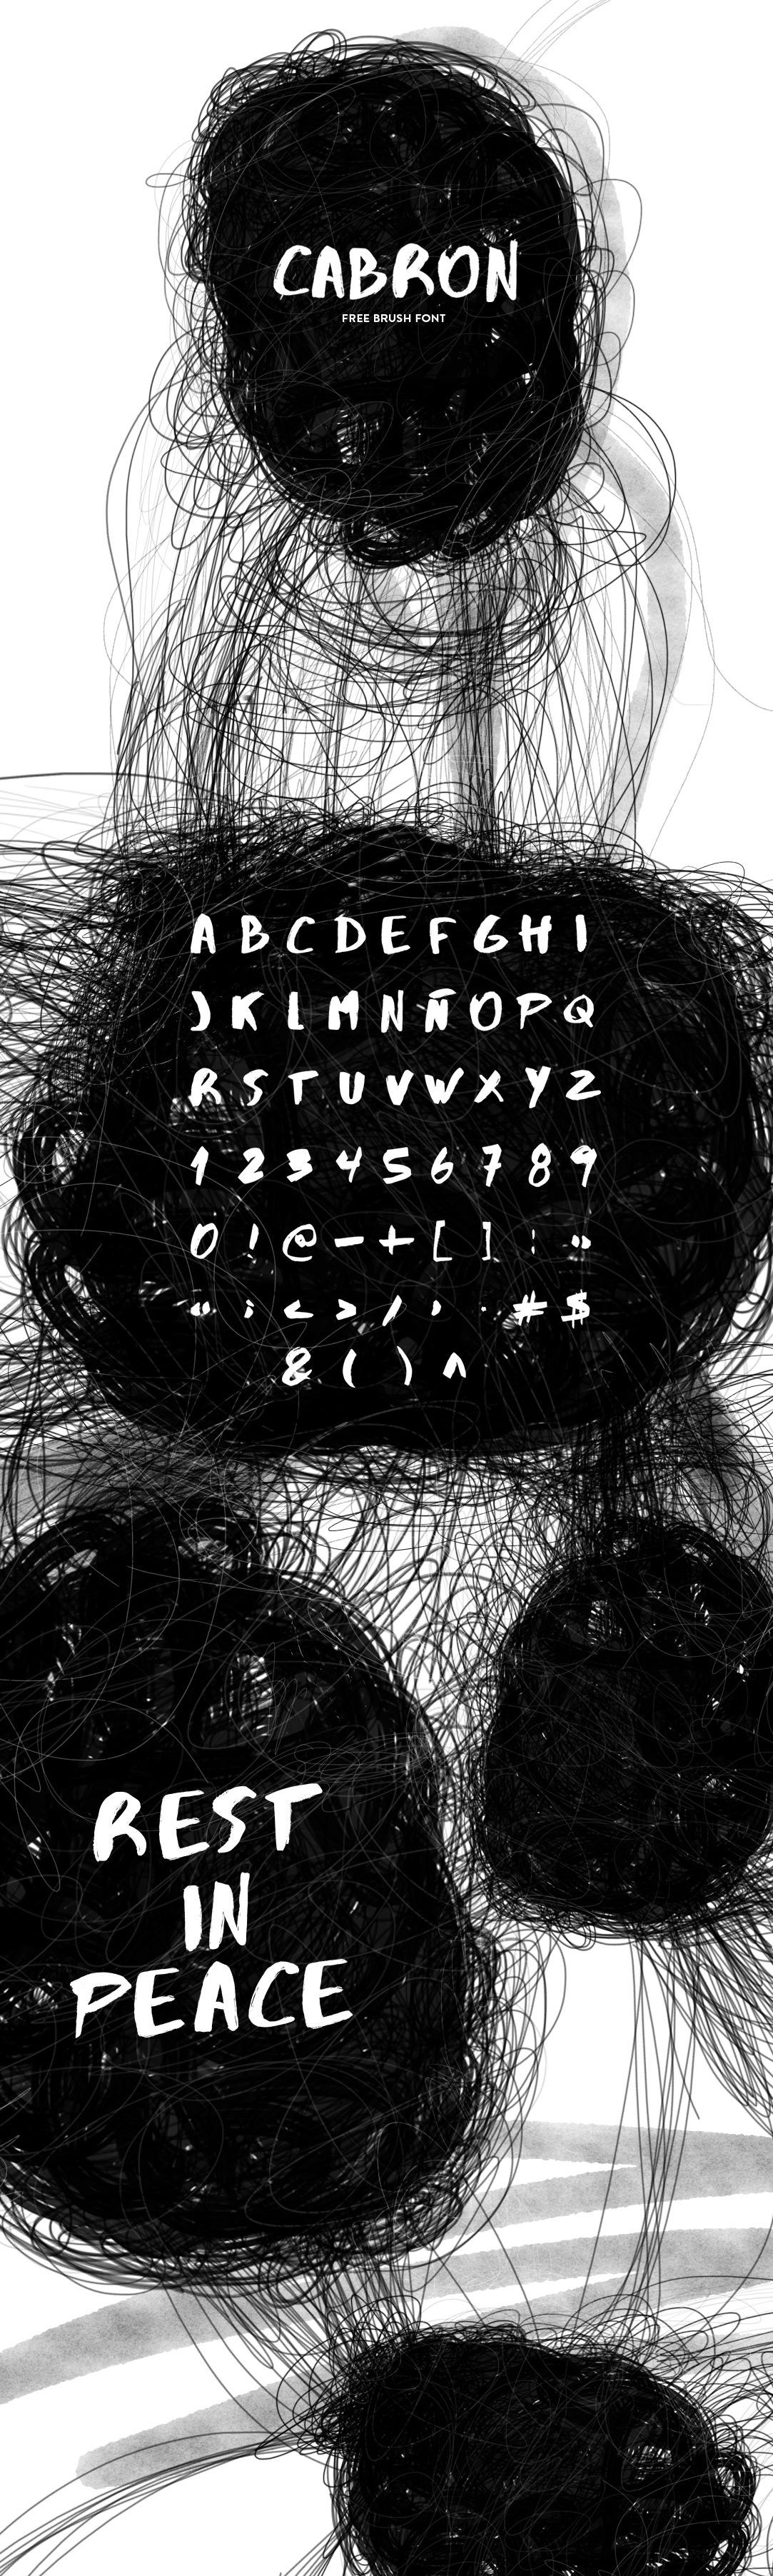 CABRON-font